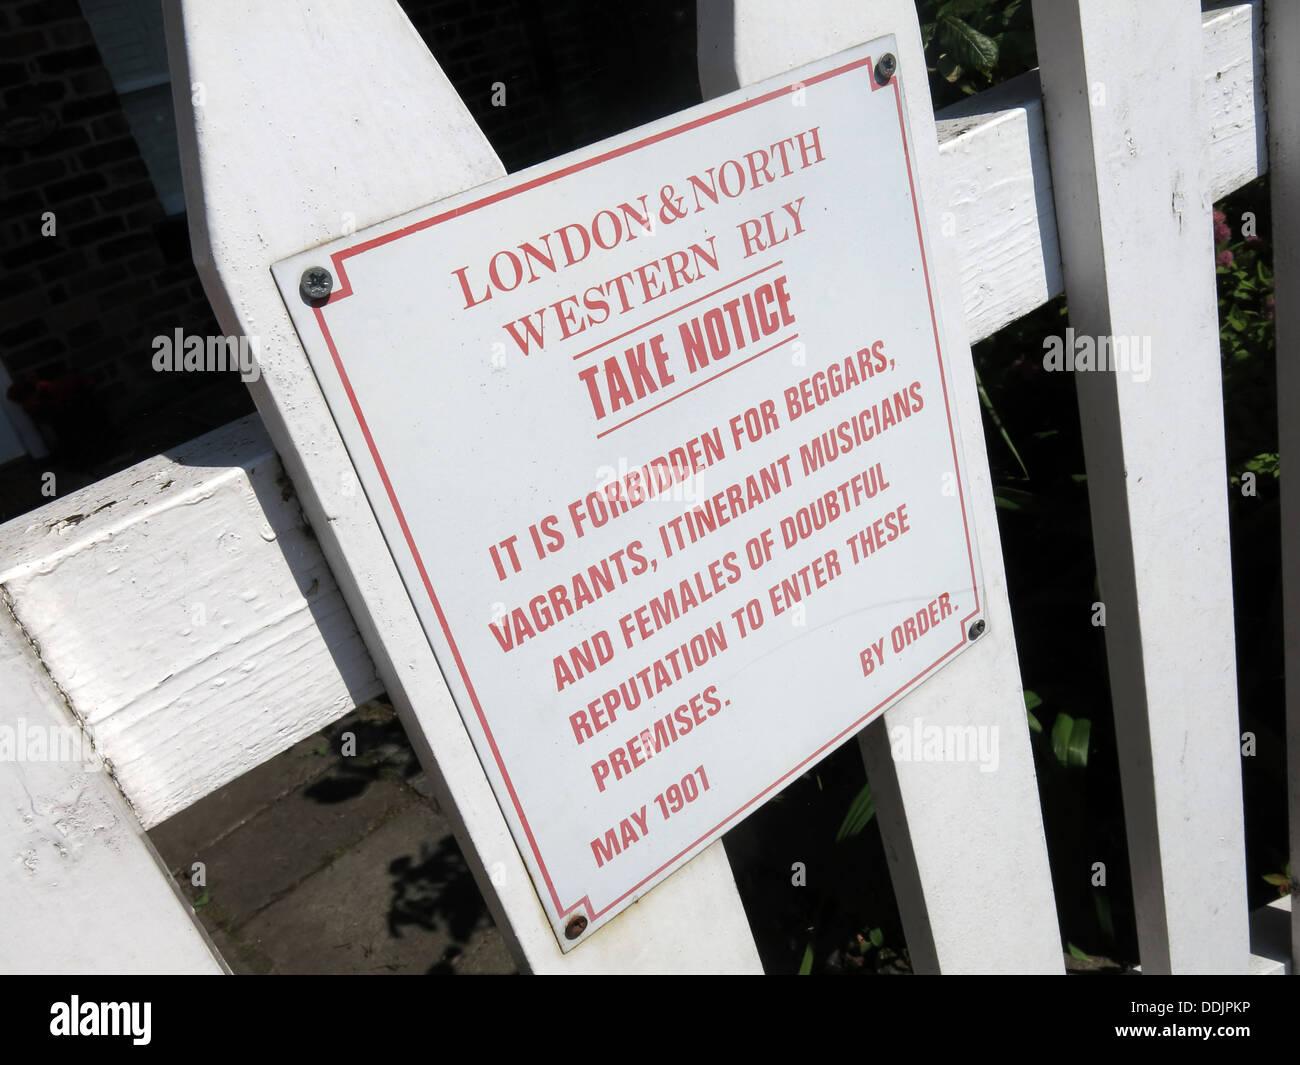 London & North Western Railway Sign - Stock Image